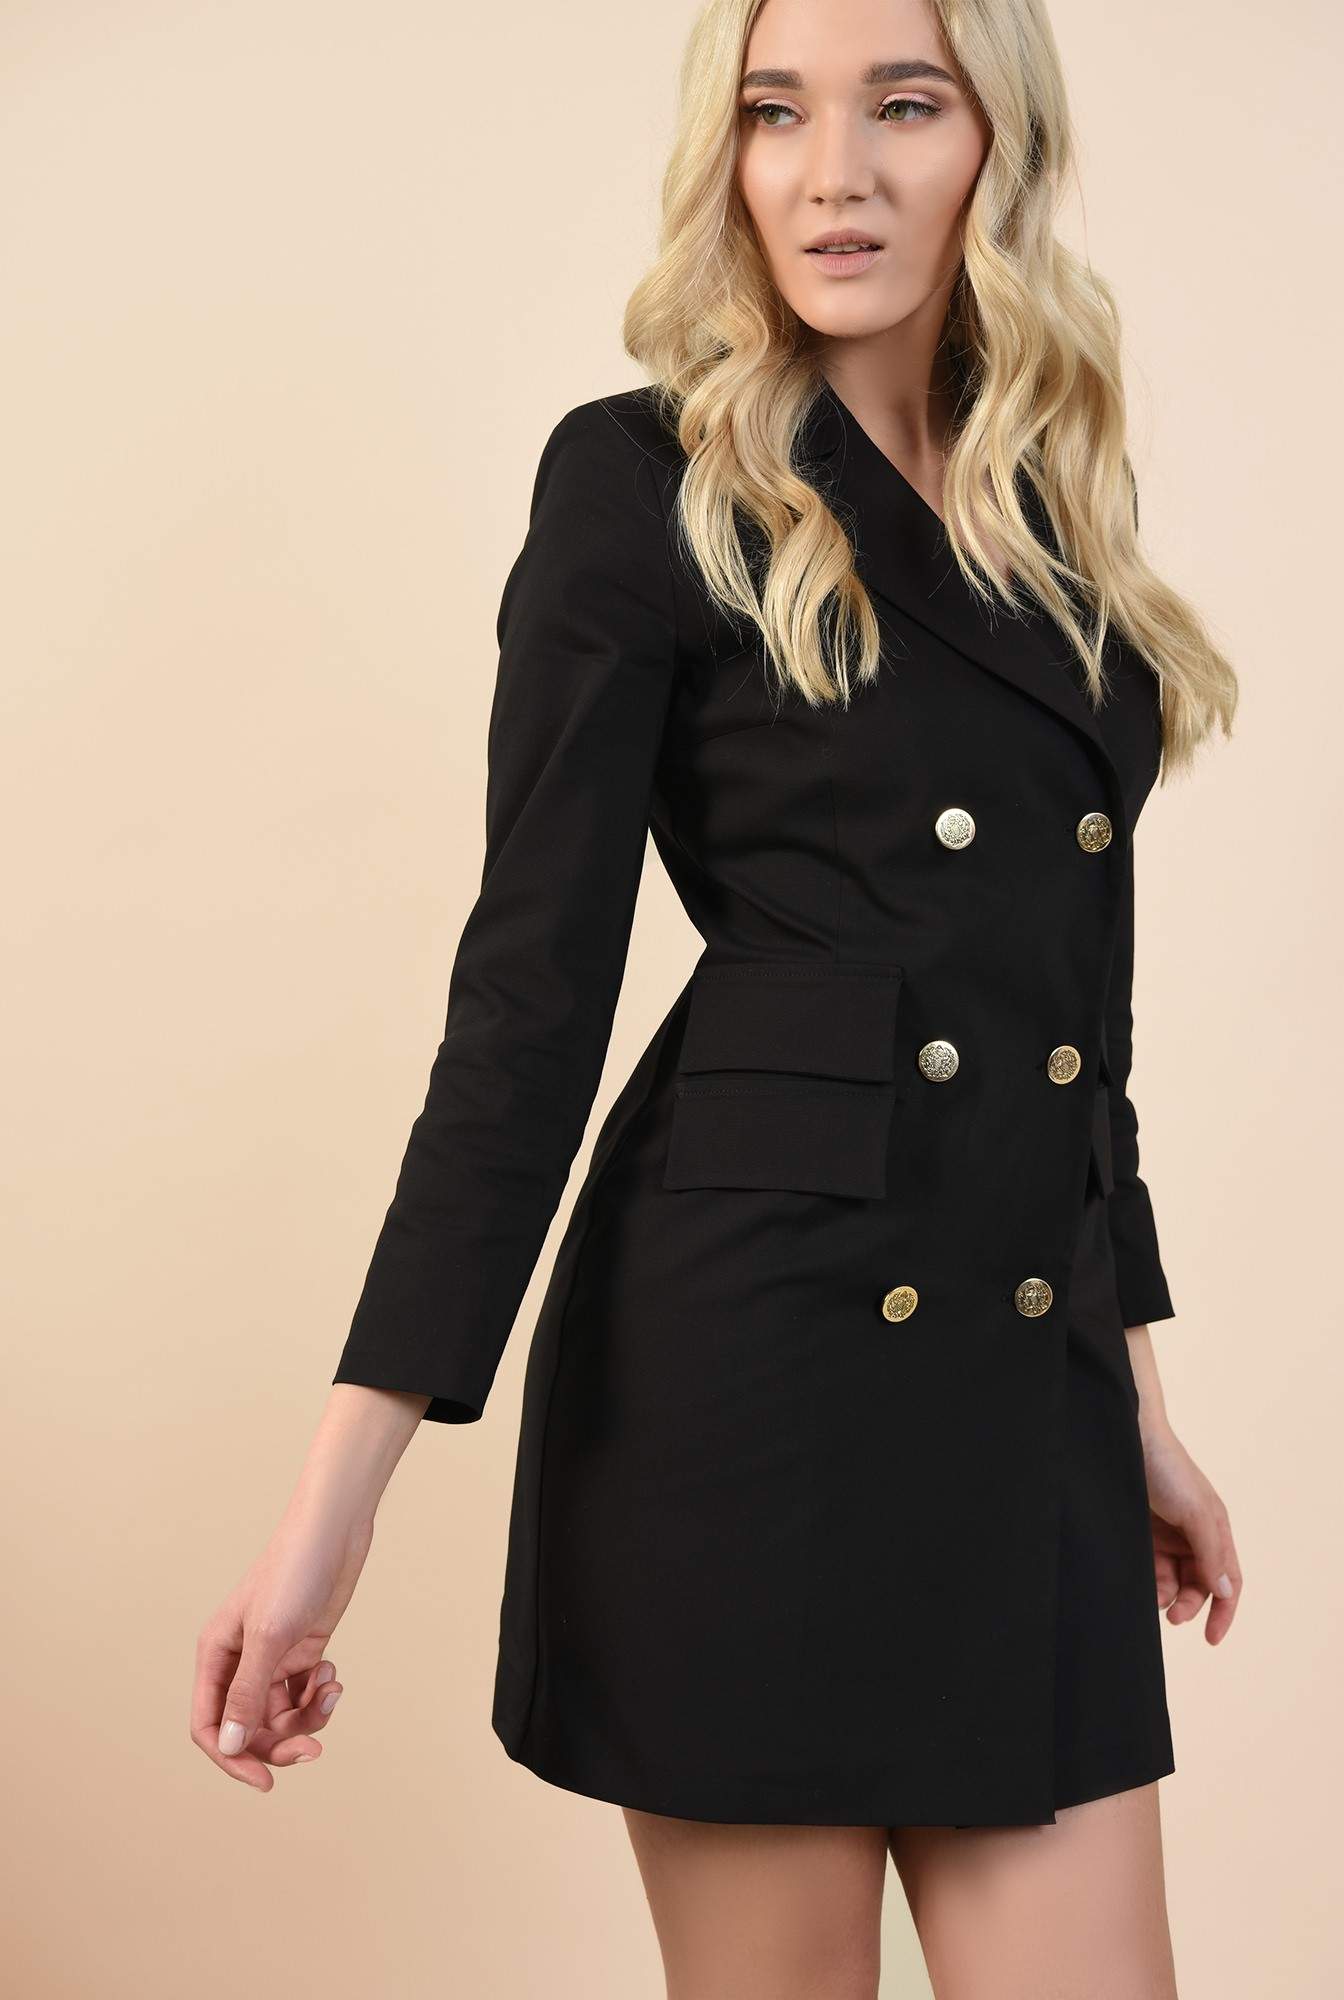 0 - rochie sacou, neagra, scurta, cambrata, rochie de ocazie